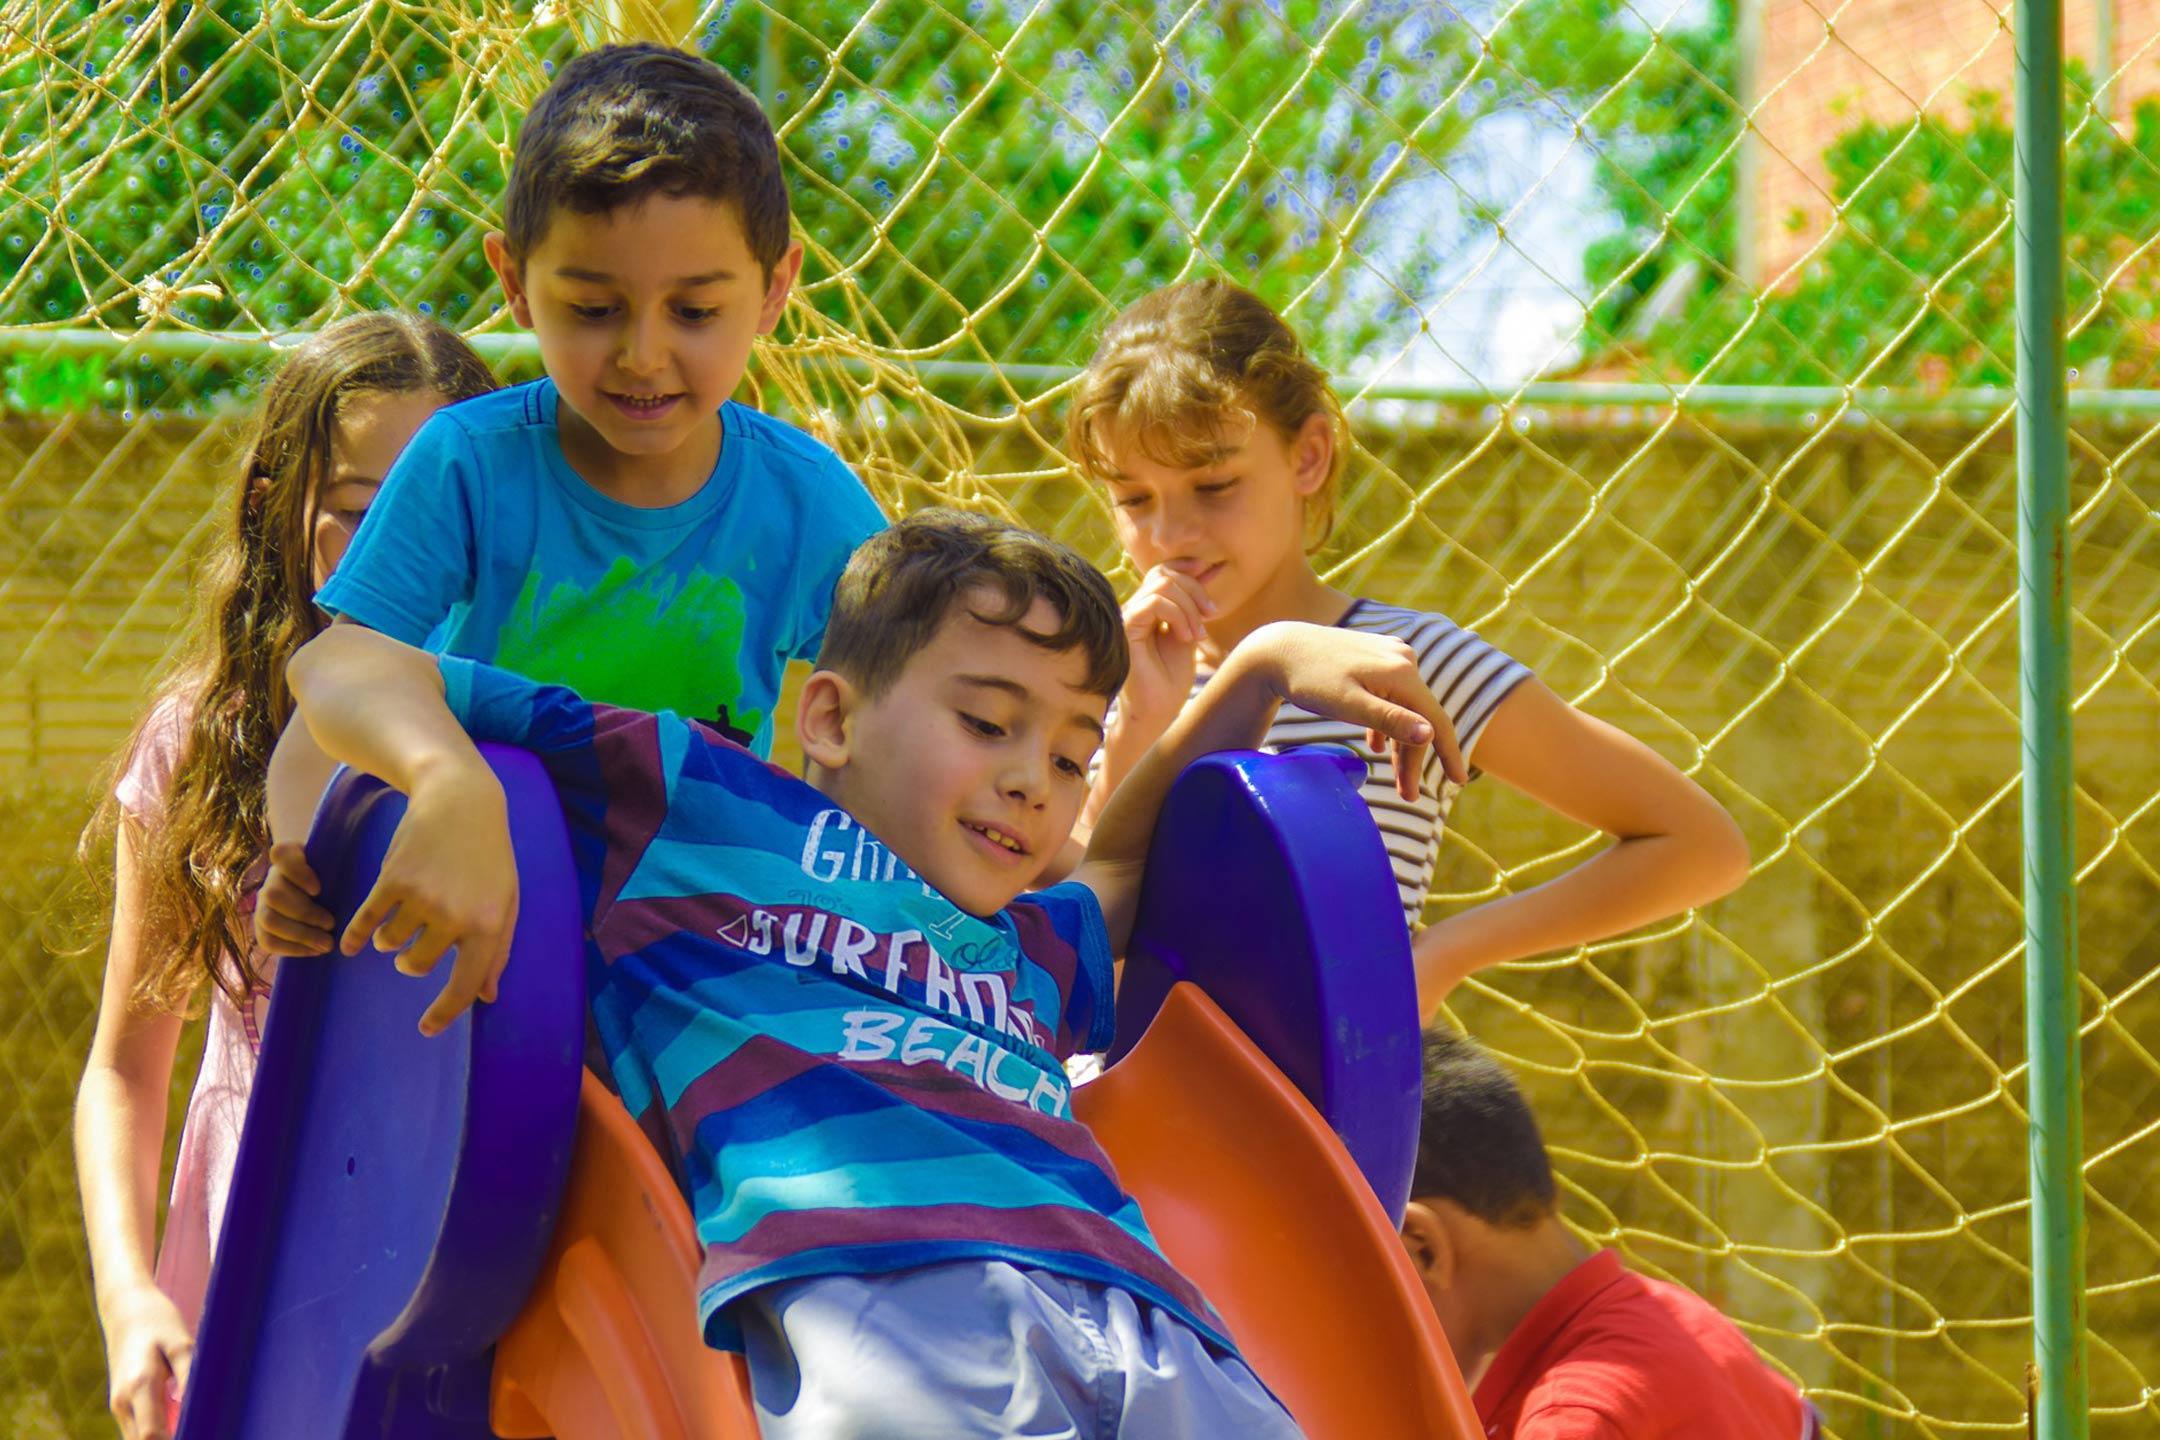 children-playing-on-slide2160